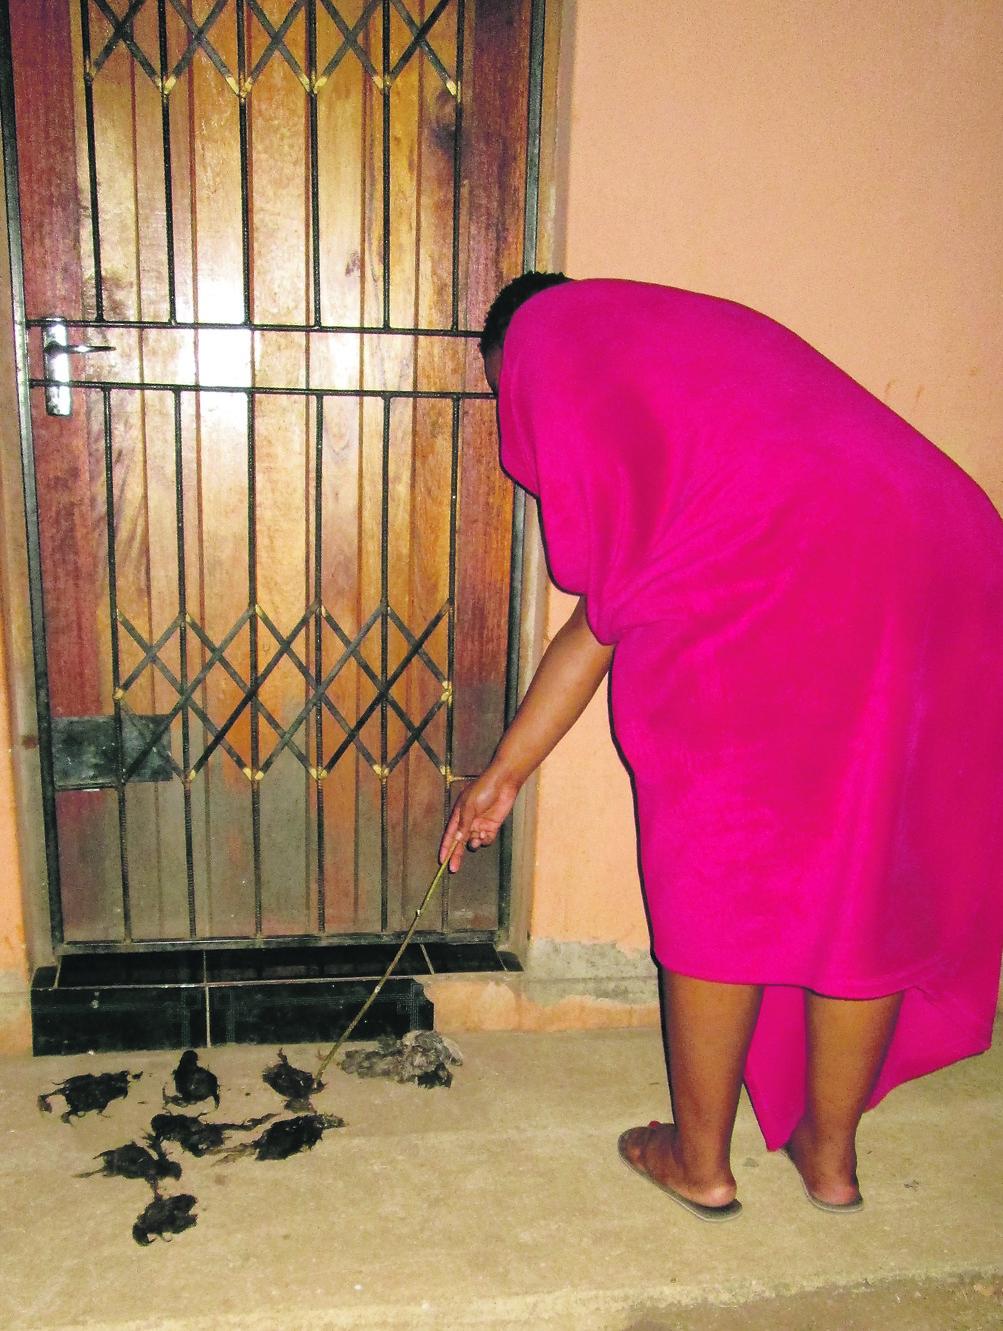 Black Dead Chicks Bad Luck On Our Doorstep Mzansi